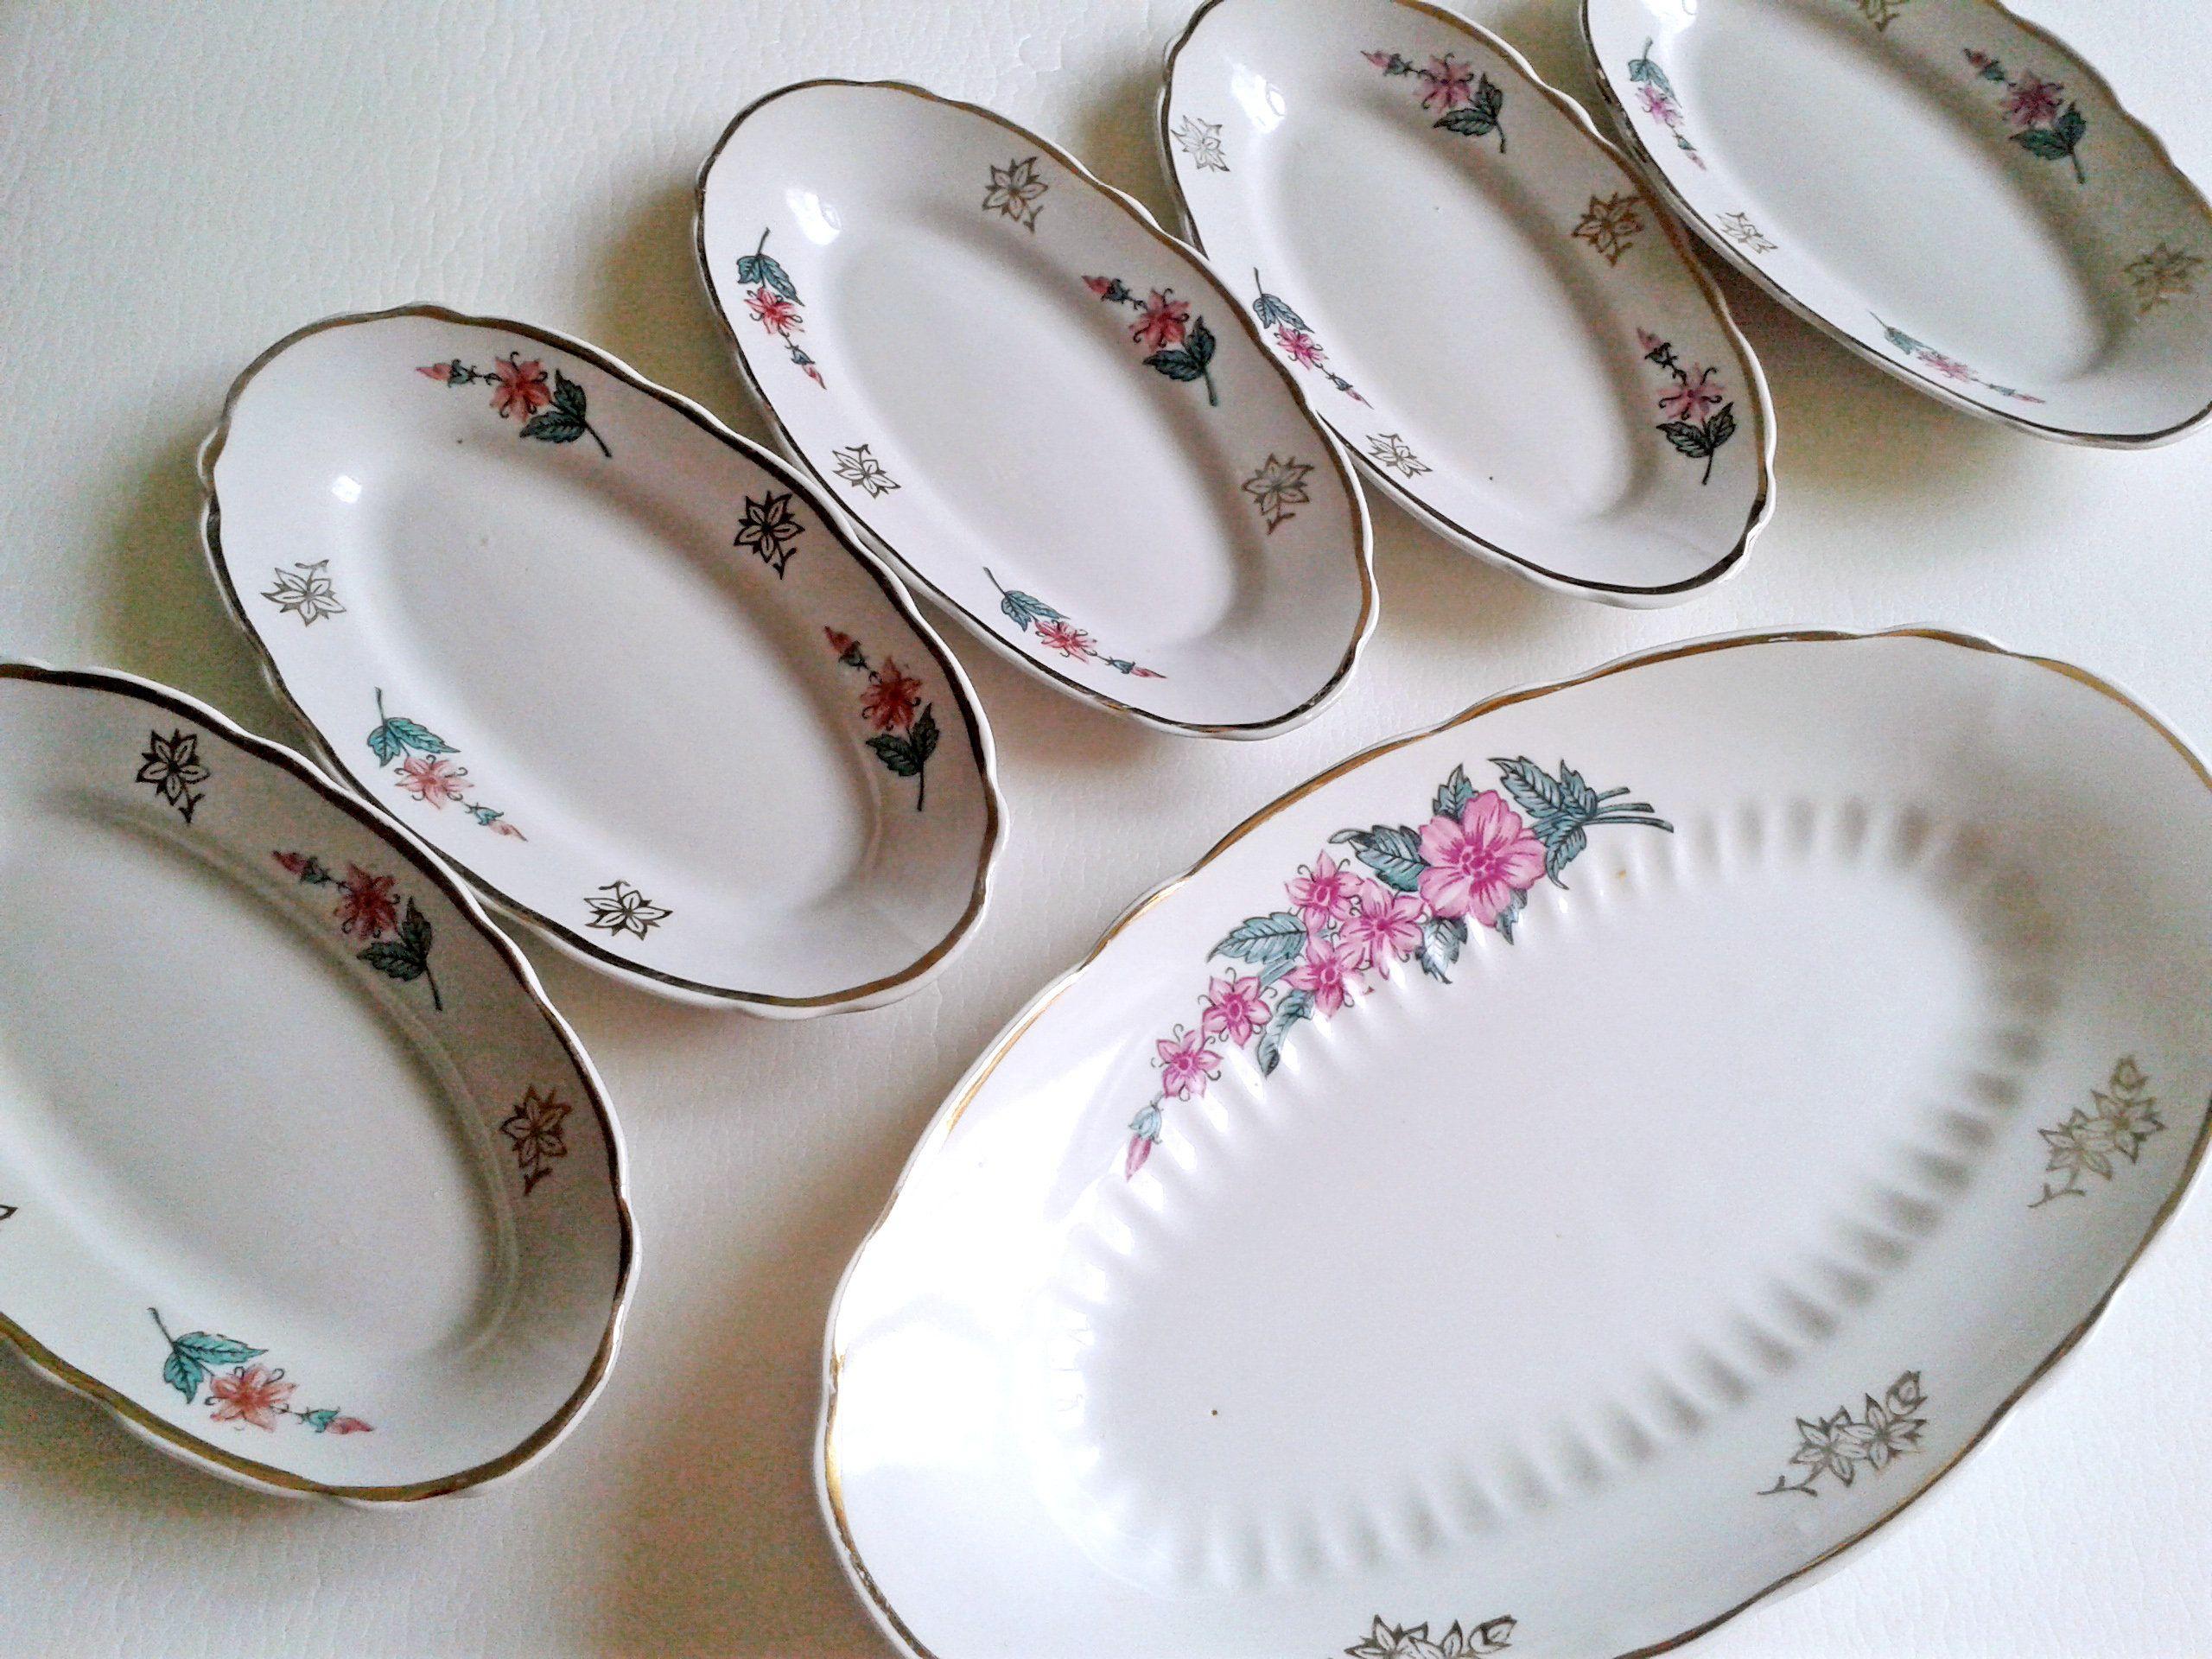 Set of 6 Small Ceramic Plates Porcelain Small Ceramic Dishes